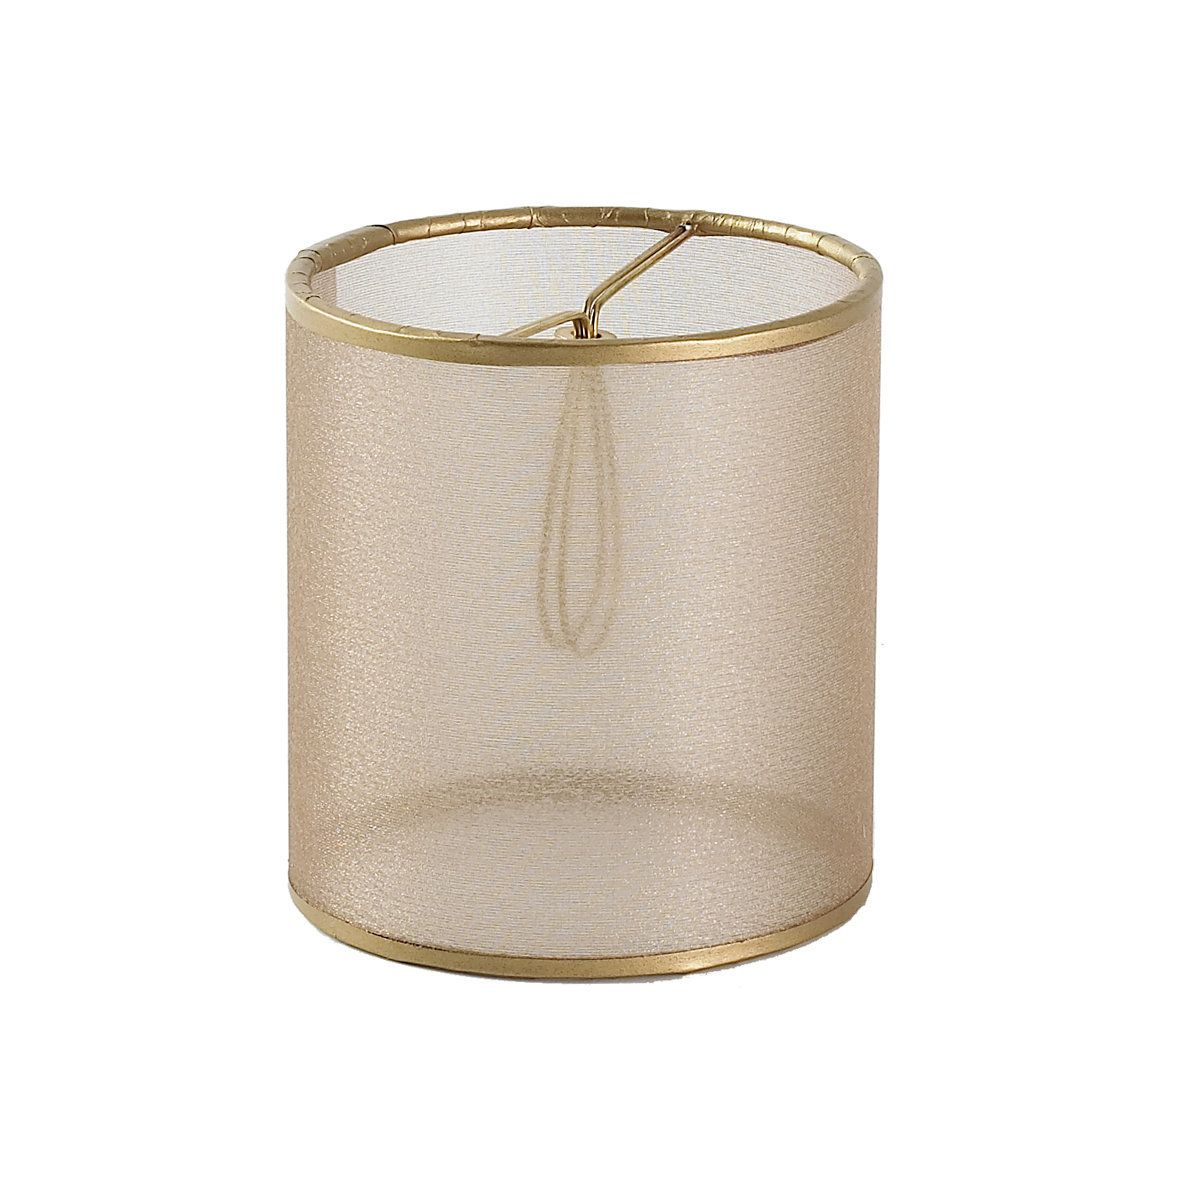 4 organza drum chandelier shadeg 12001200 organza drum clip on chandelier shade arubaitofo Image collections